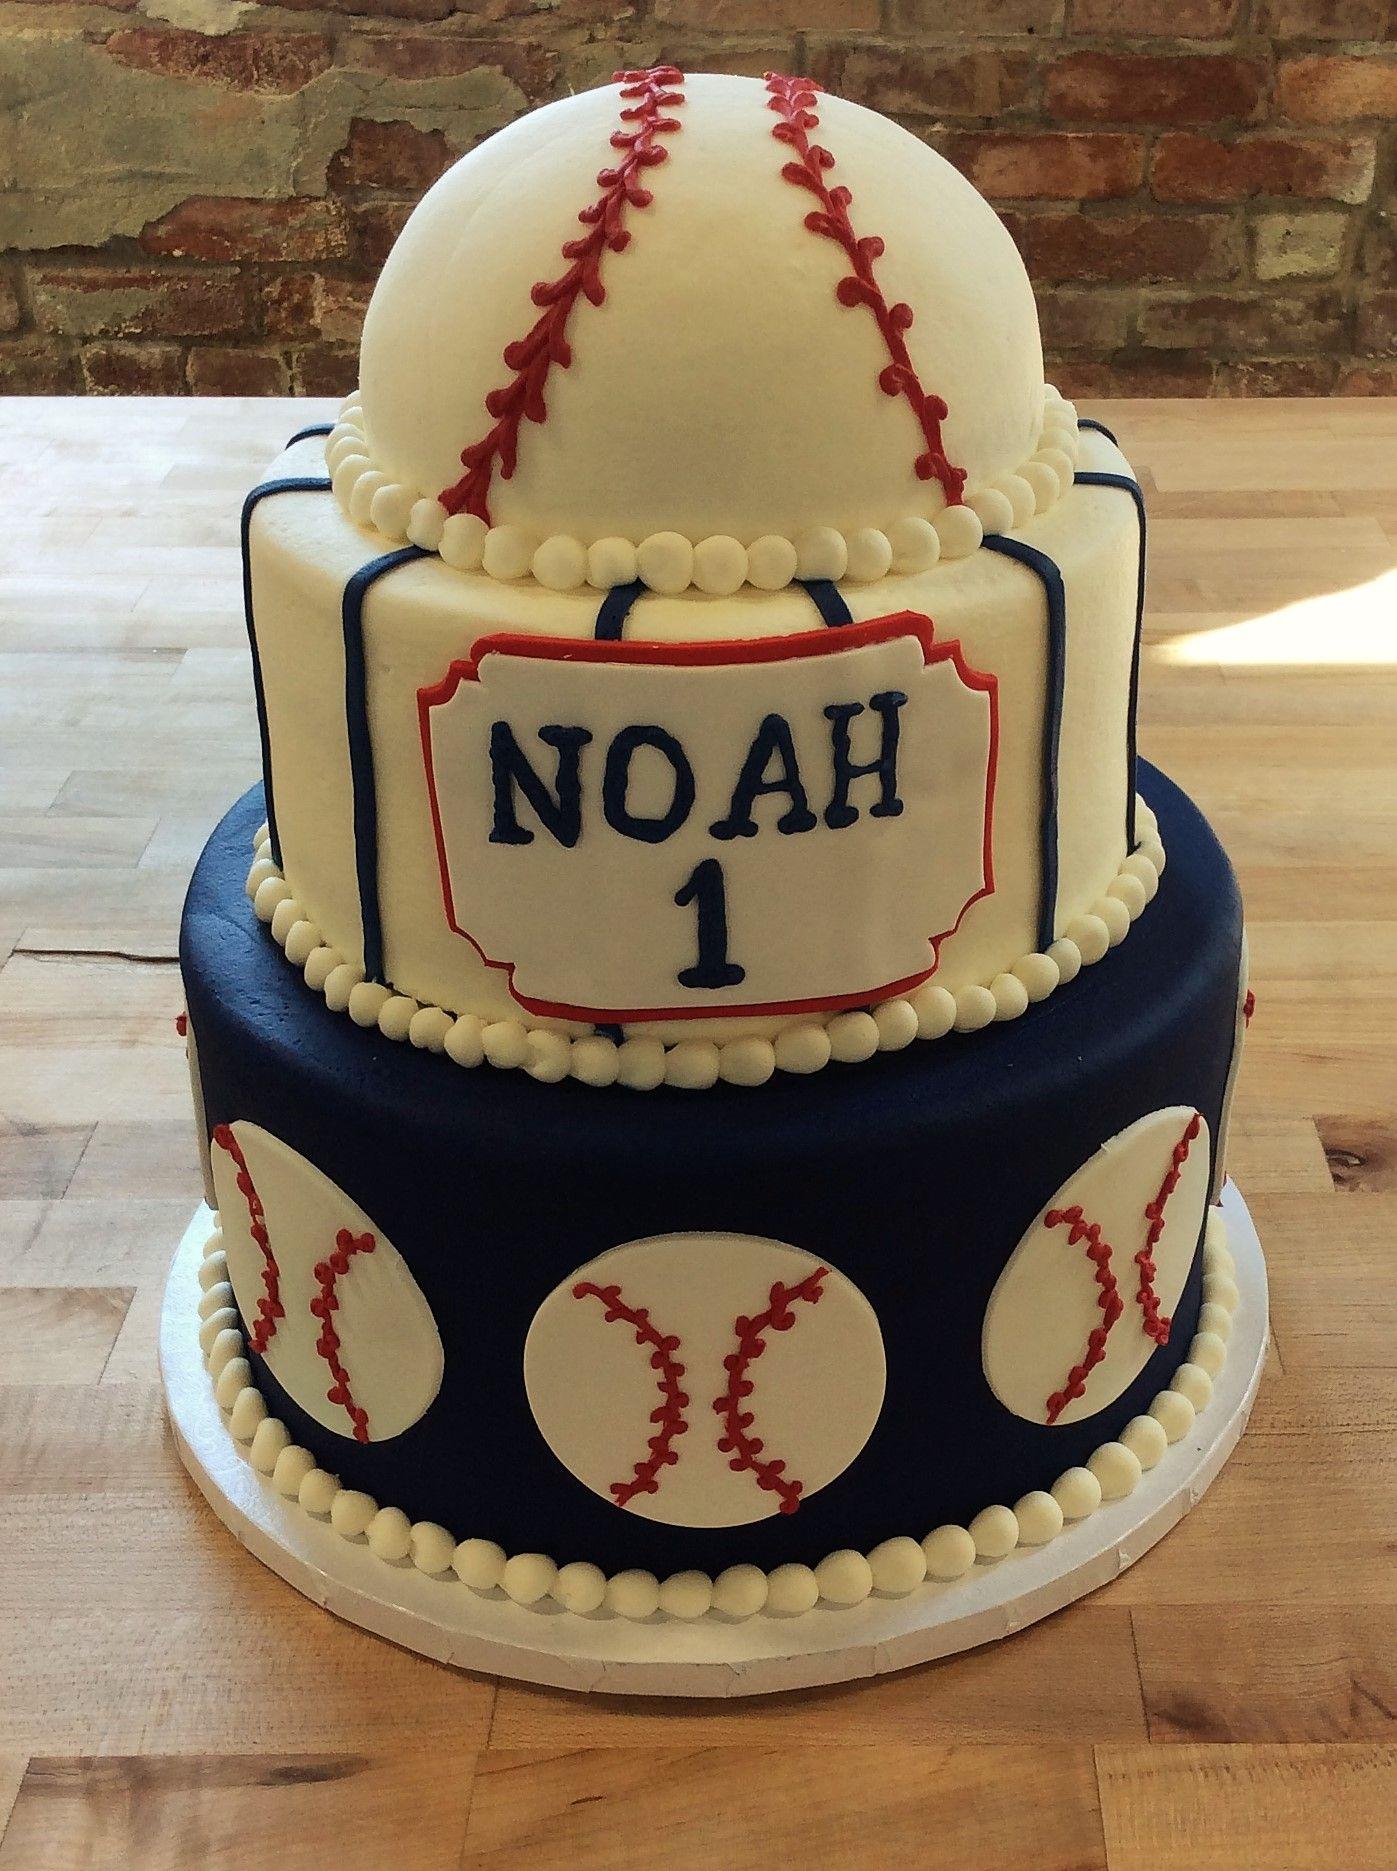 Astonishing Baseball Themed First Birthday Cake Baseball Birthday Cakes Funny Birthday Cards Online Fluifree Goldxyz